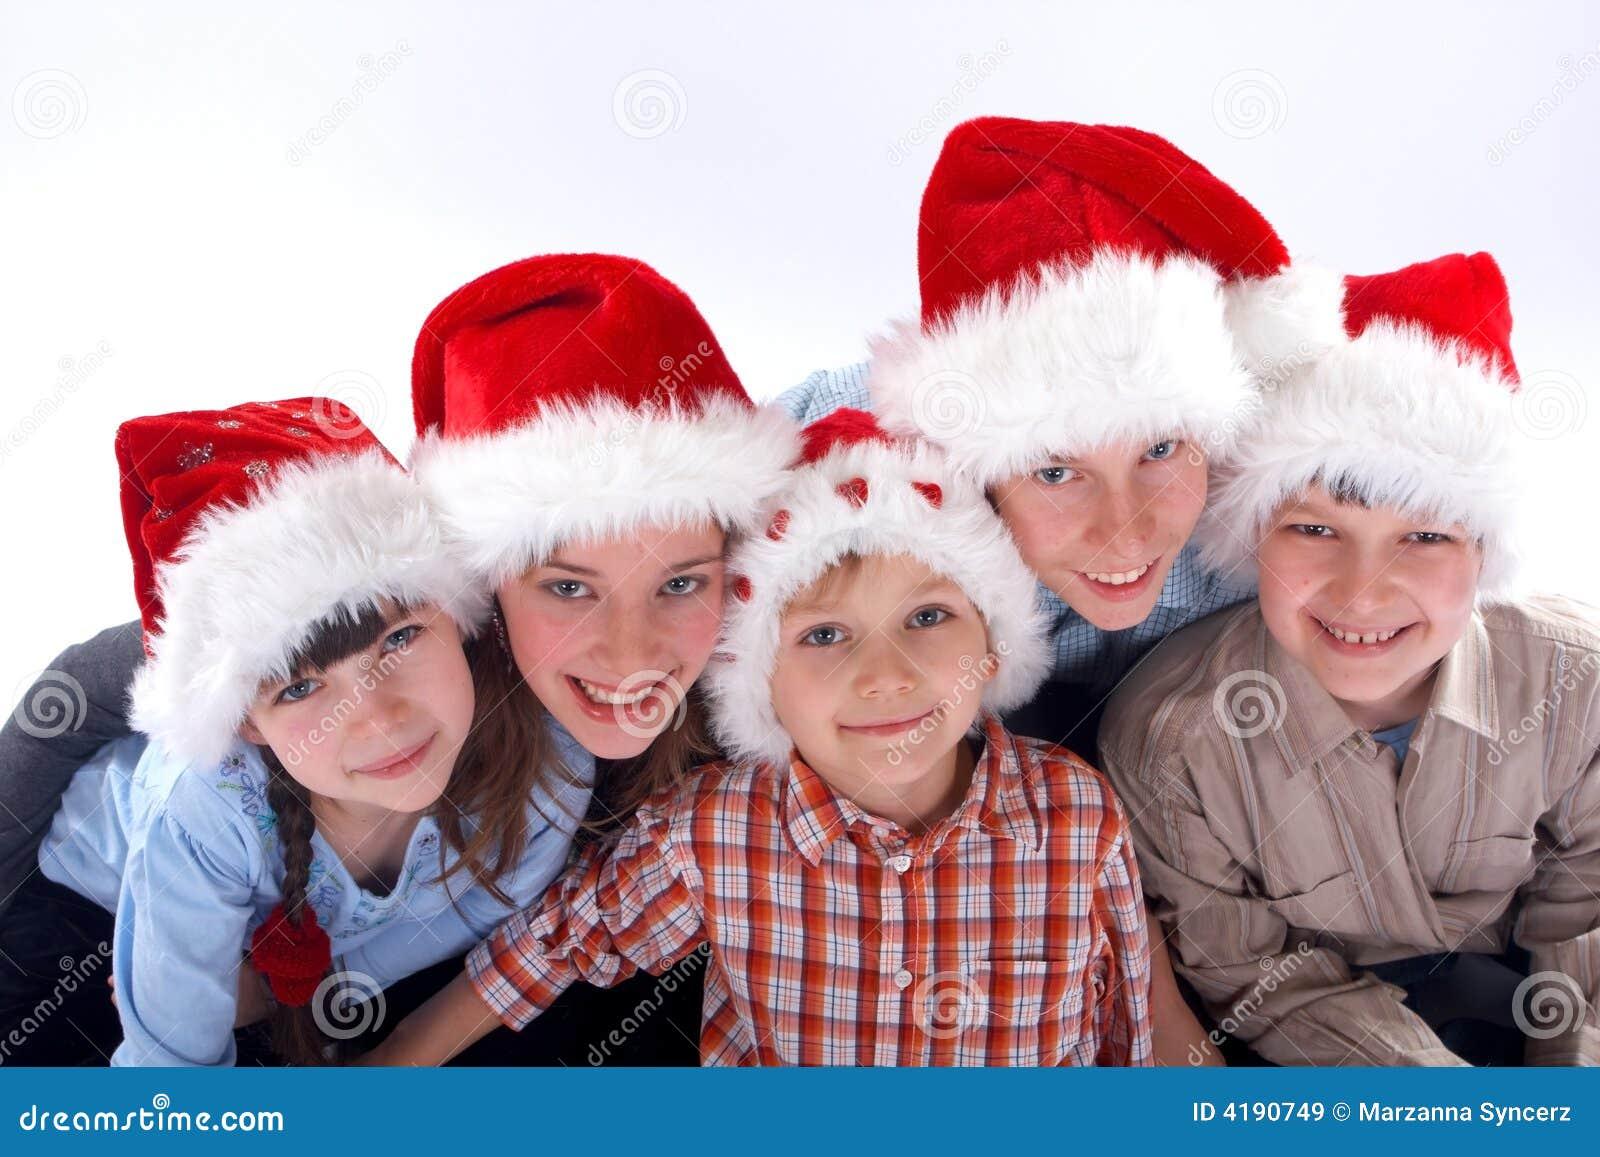 Christmas Family Photo Christmas Family Portrait Royalty Free Stock Images Image 4190749